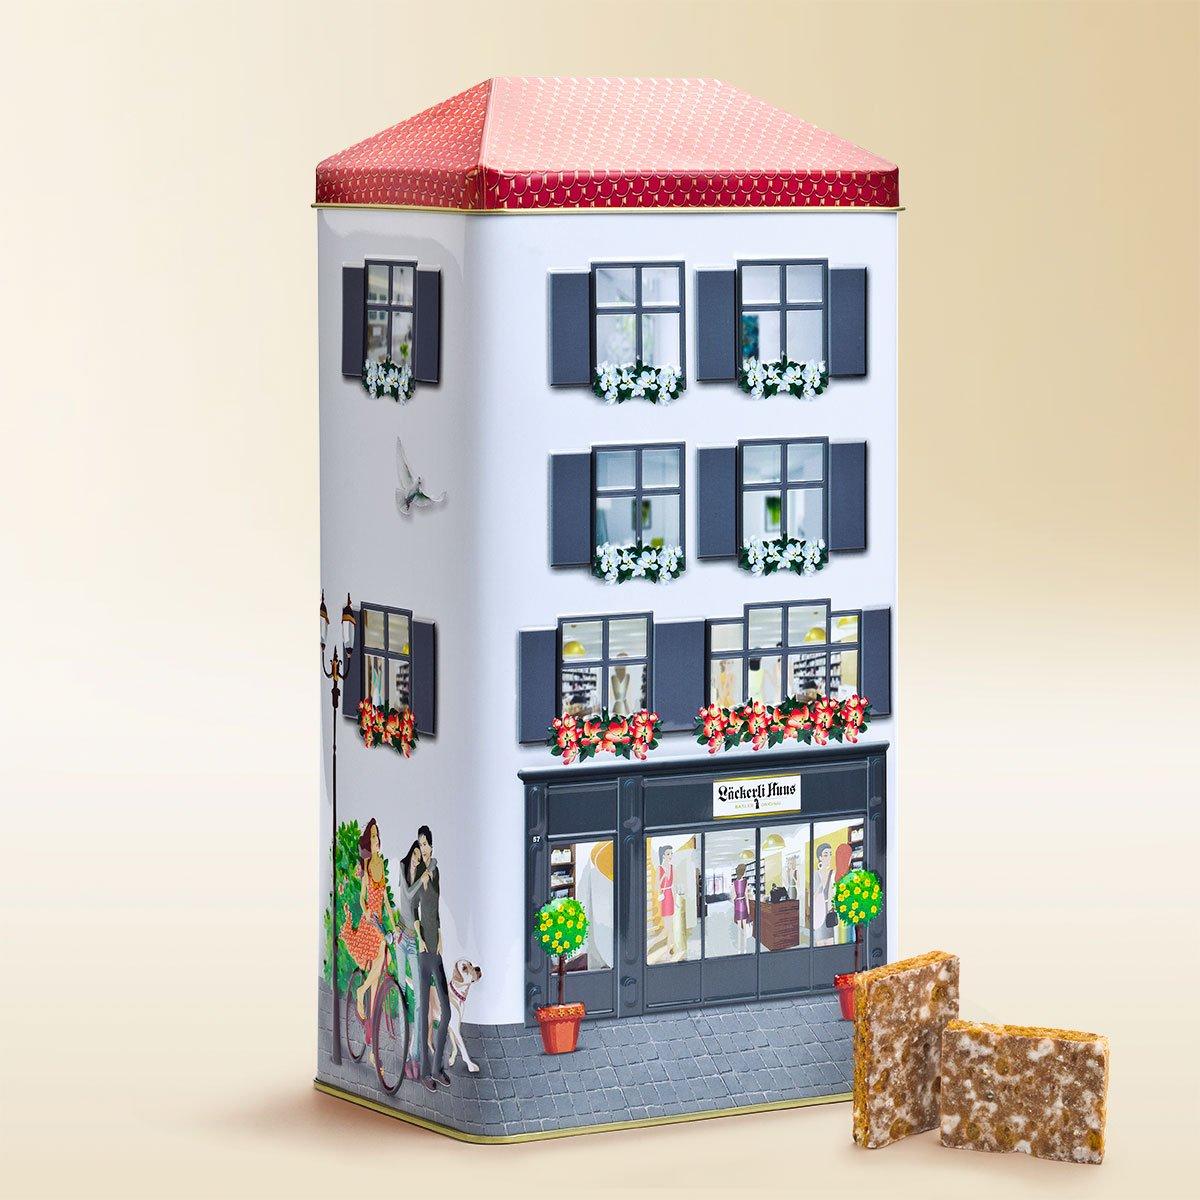 Energiewert Haus: Dose Läckerli Huus 1kg